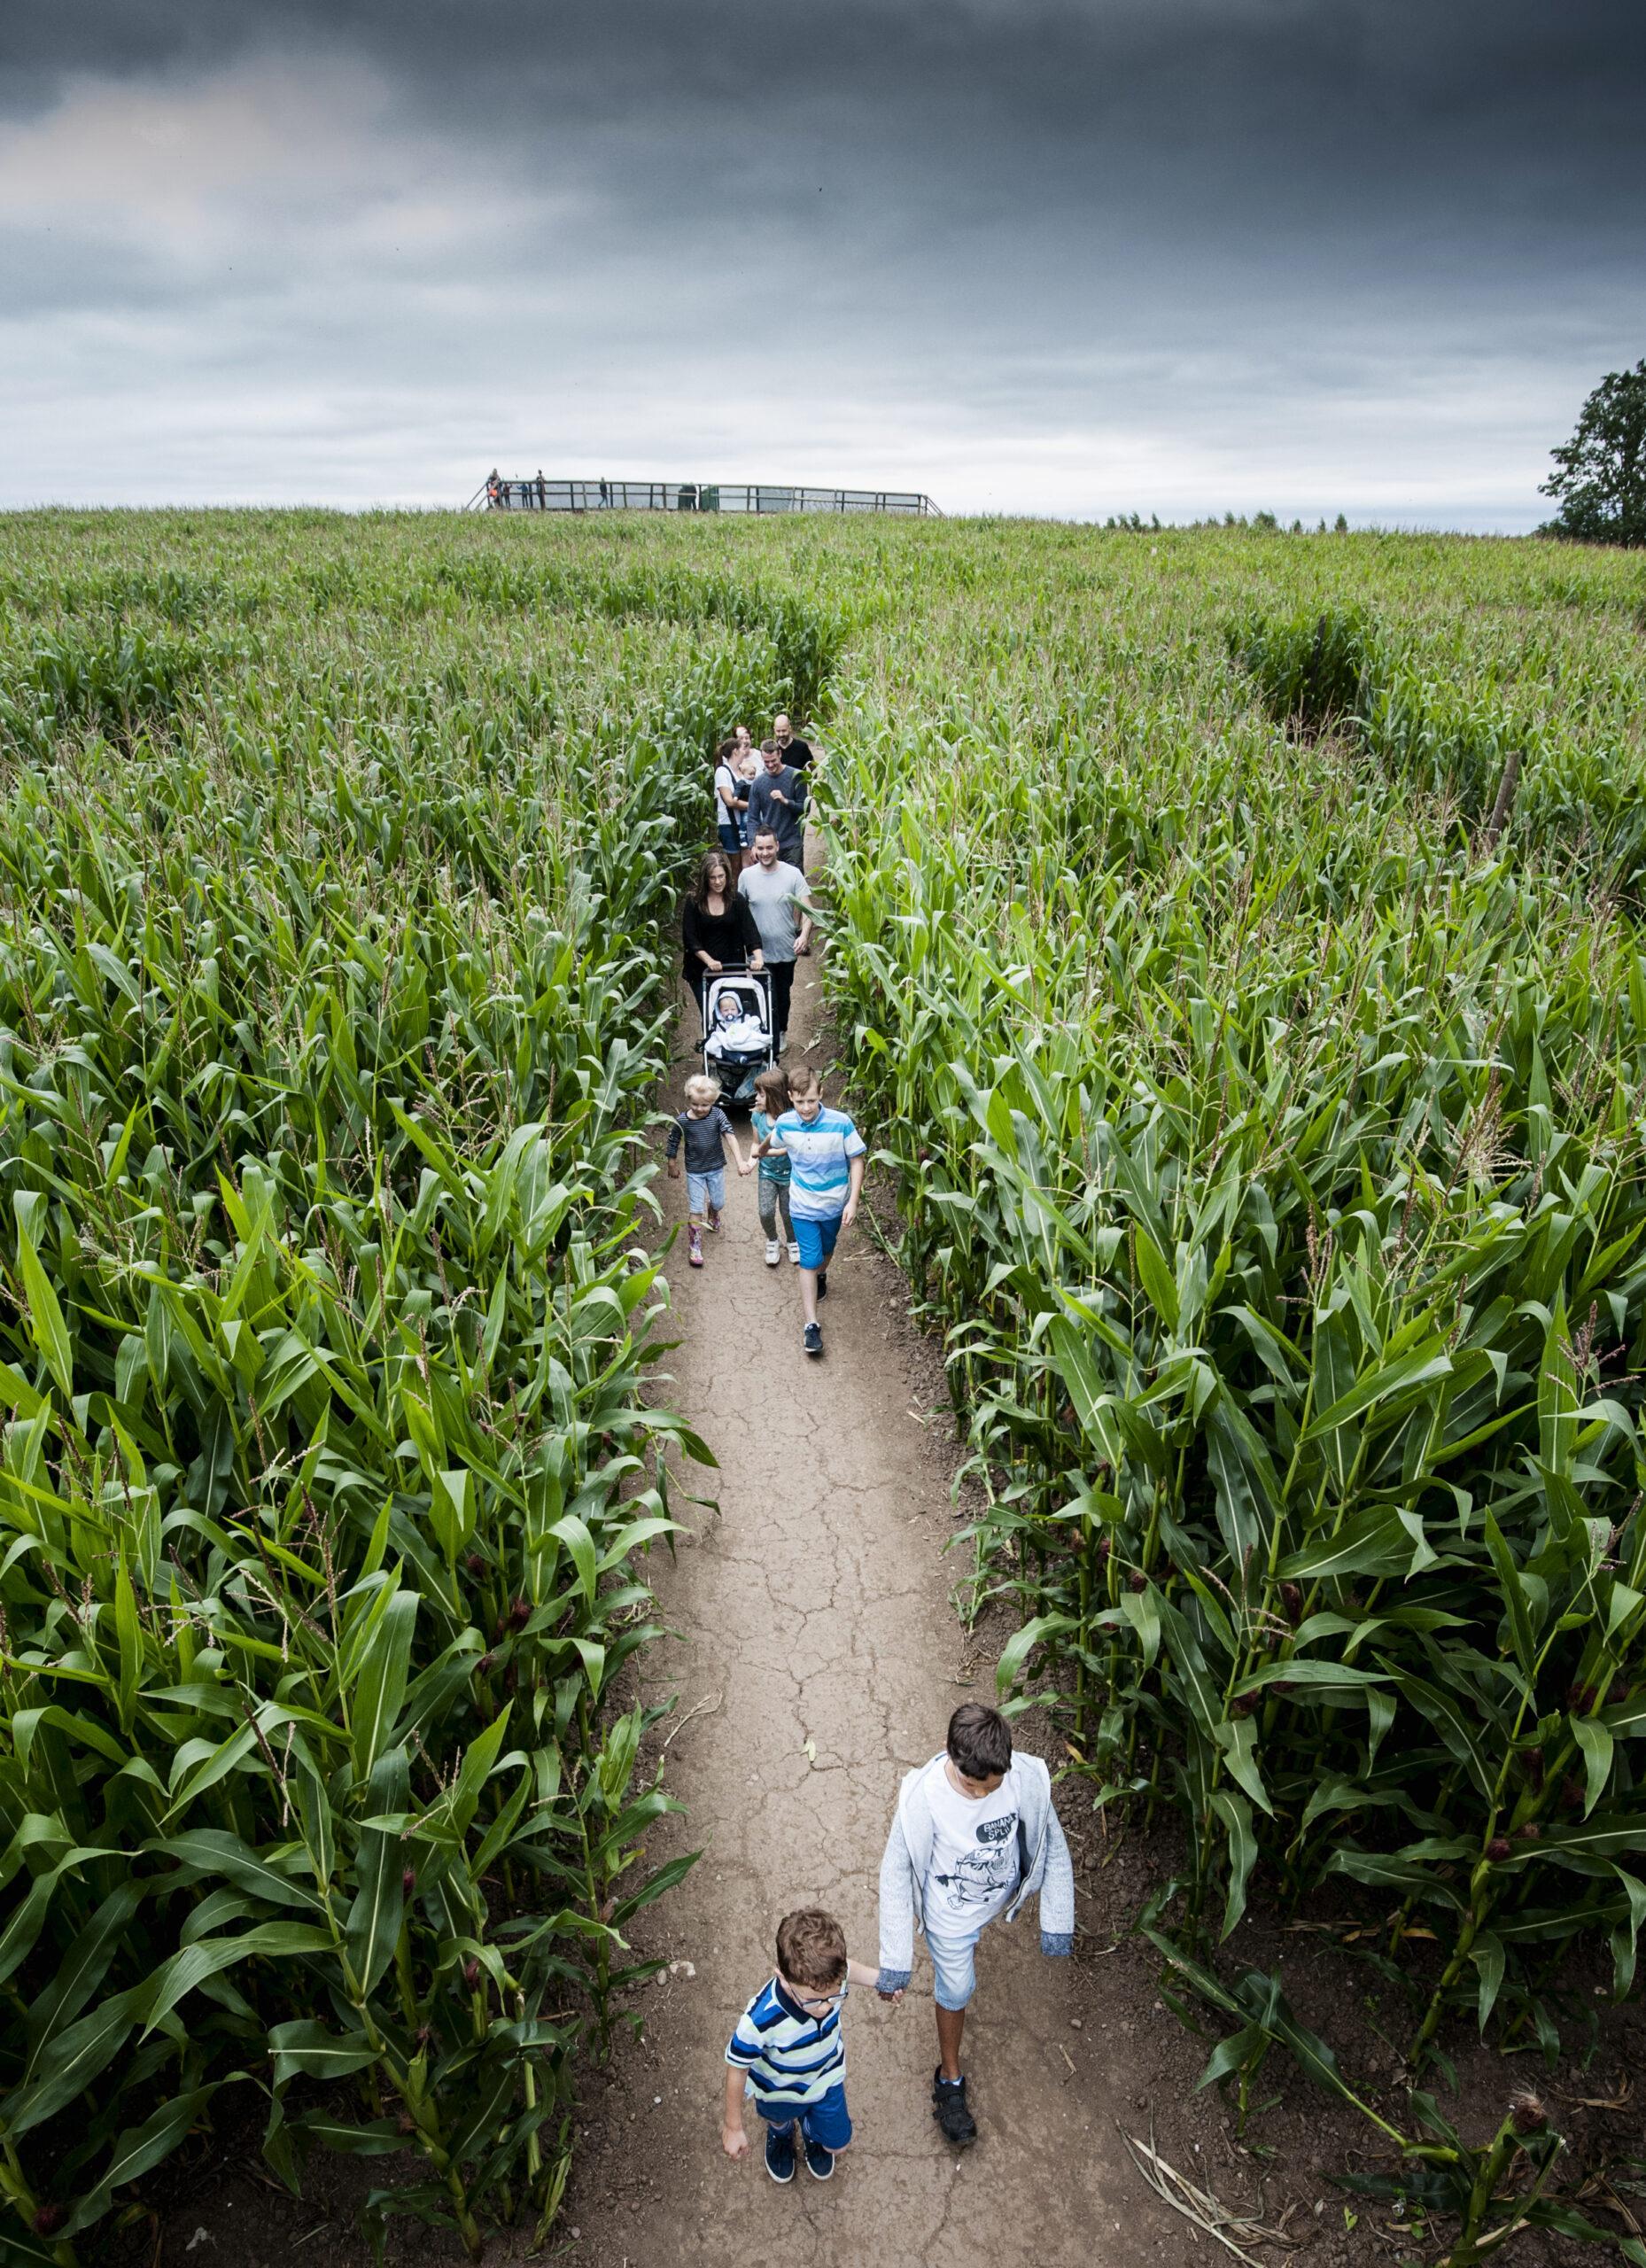 13 family members walking around maize maze